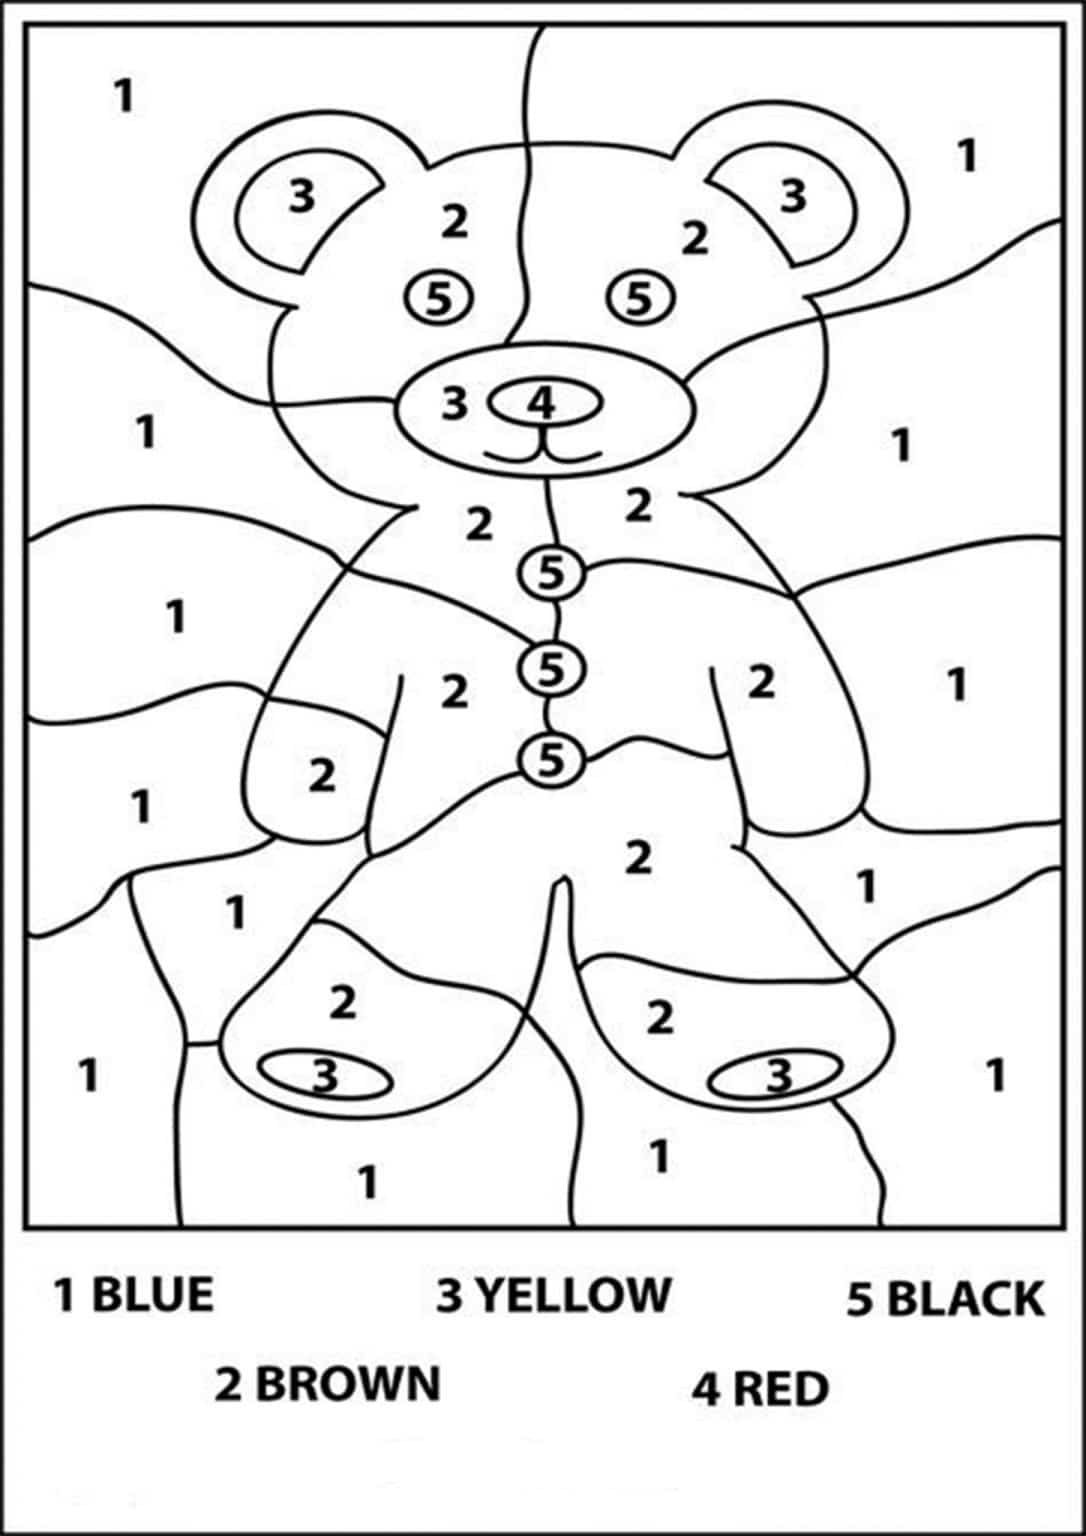 Free Printable Color By Number Worksheets For Kindergarten Kindergarten Colors Numbers Preschool Coloring Worksheets For Kindergarten [ 1536 x 1086 Pixel ]